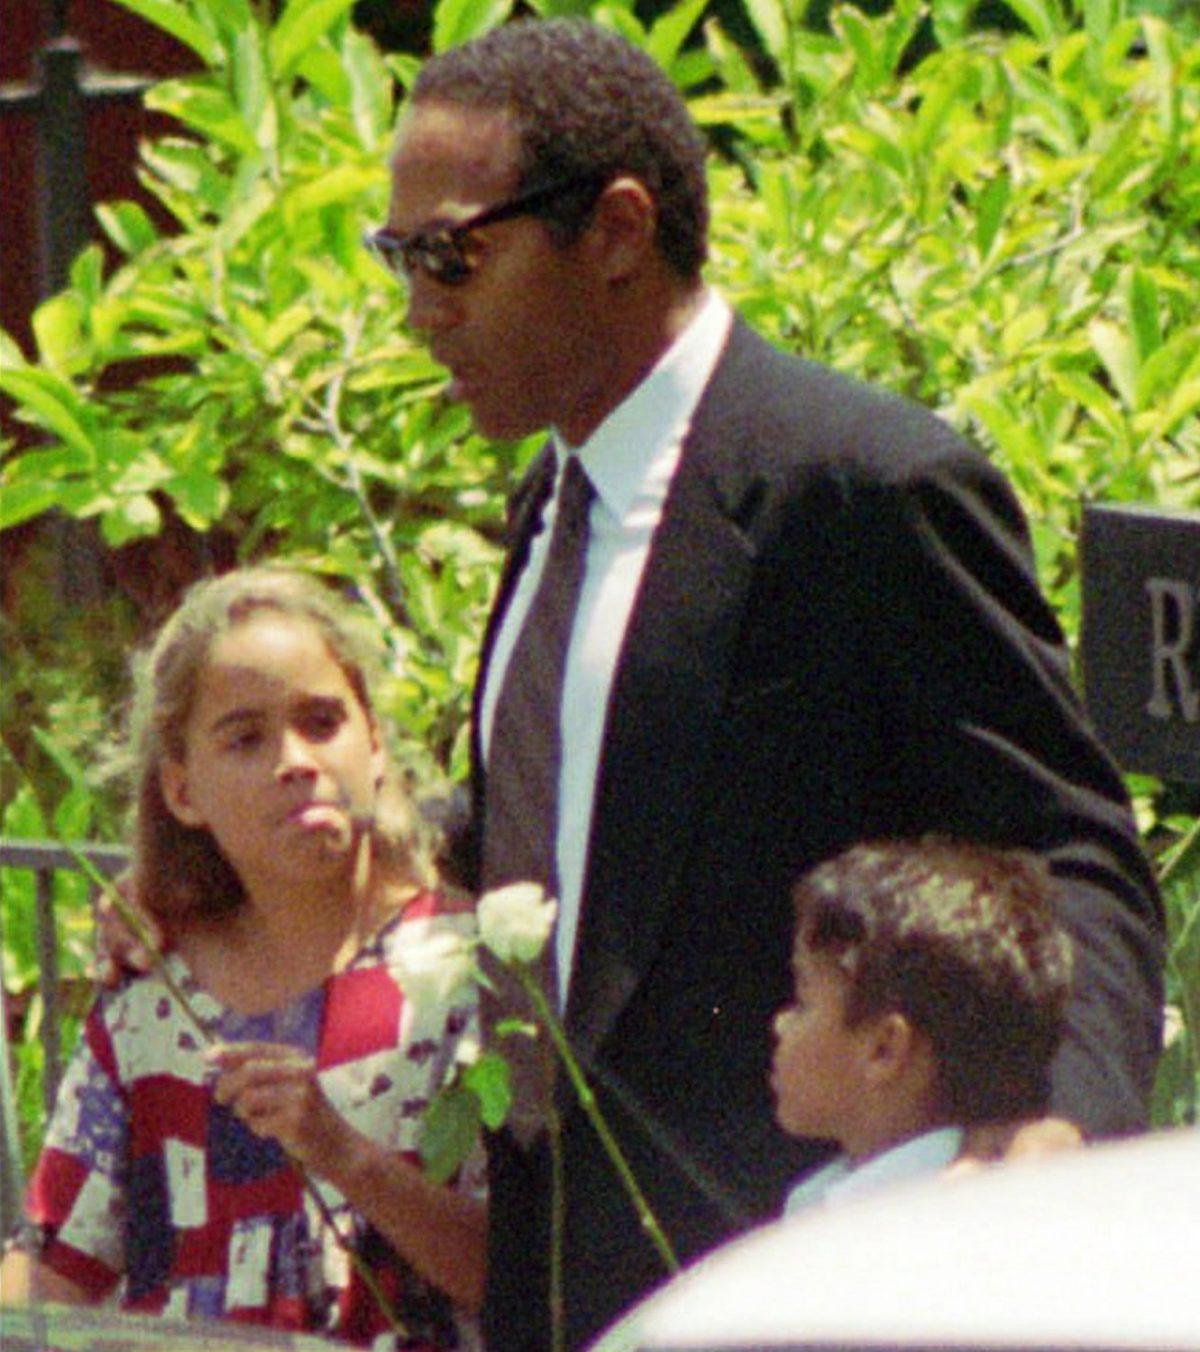 OJ simpson and kids